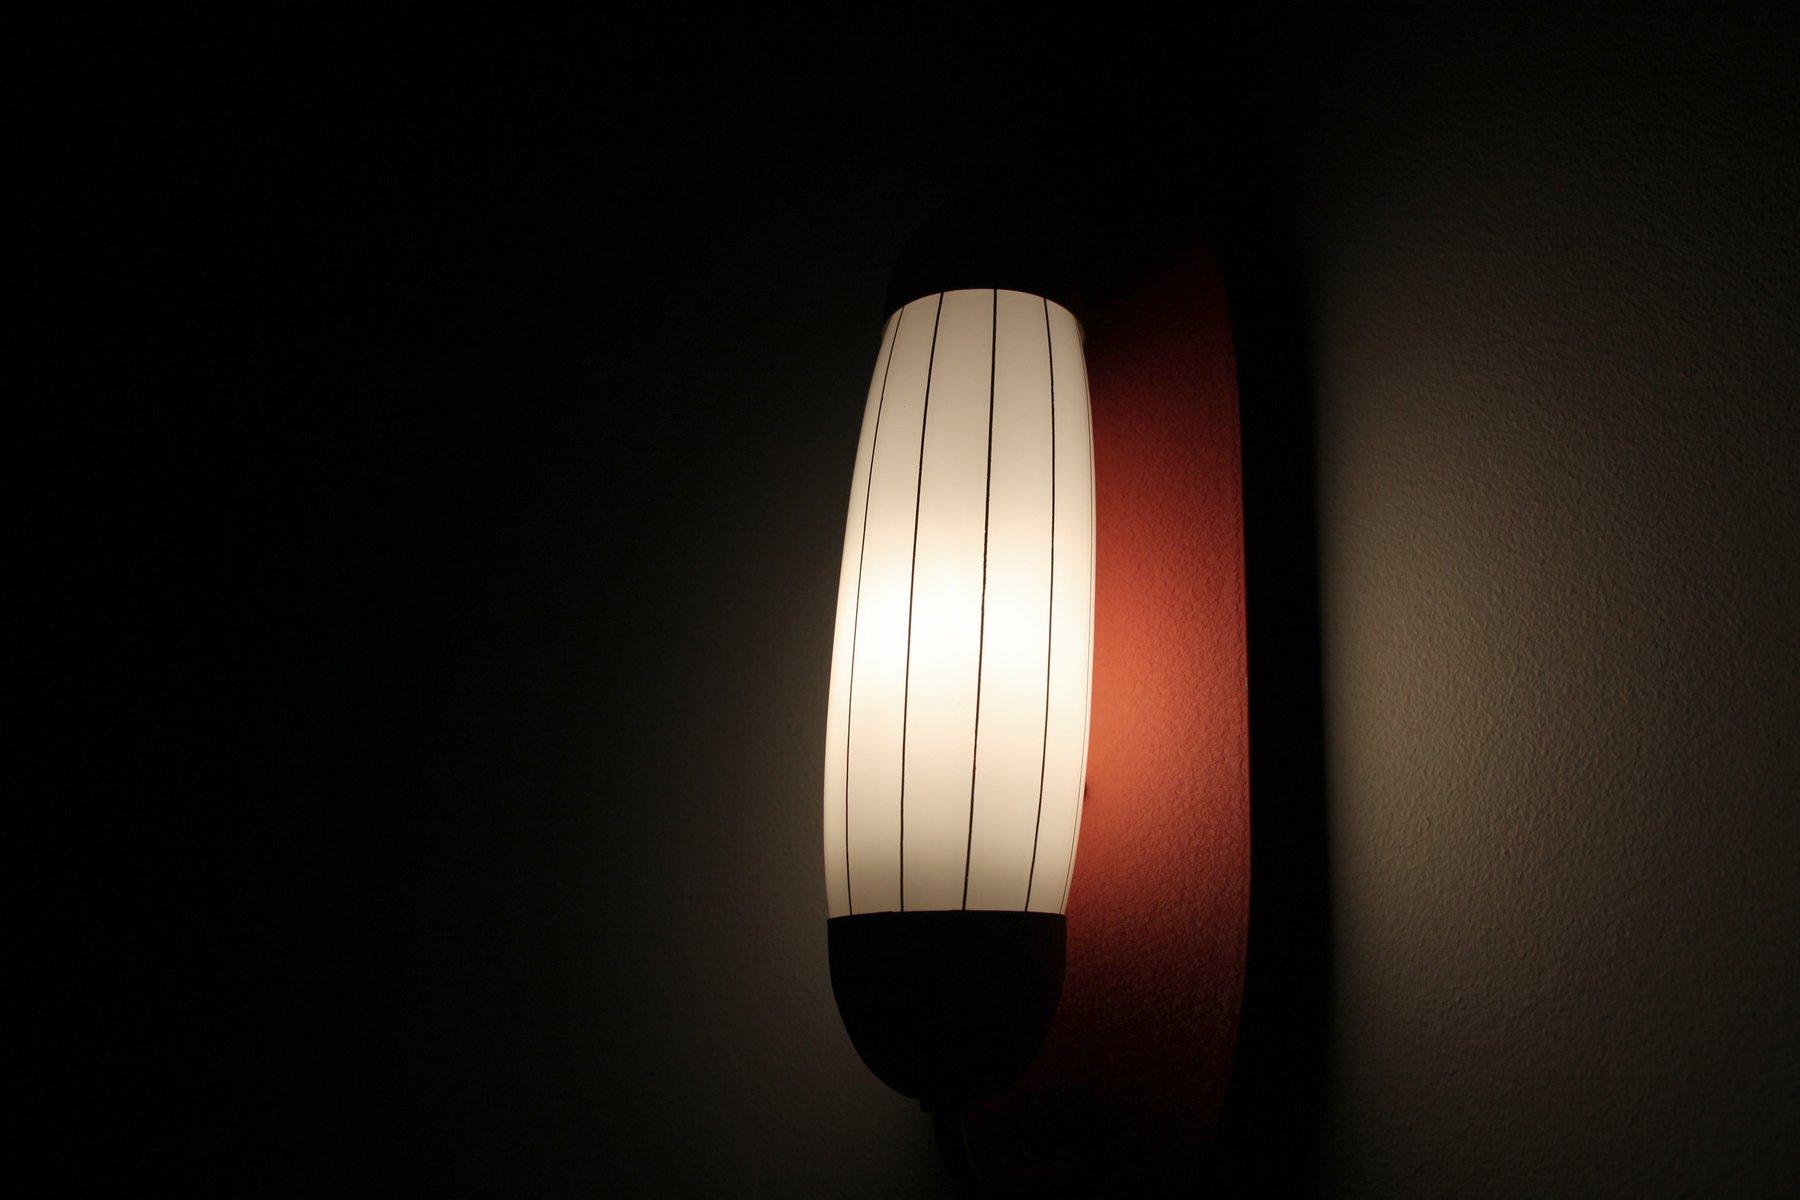 Decorative Scandinavian Wall Light, 1950s for sale at Pamono